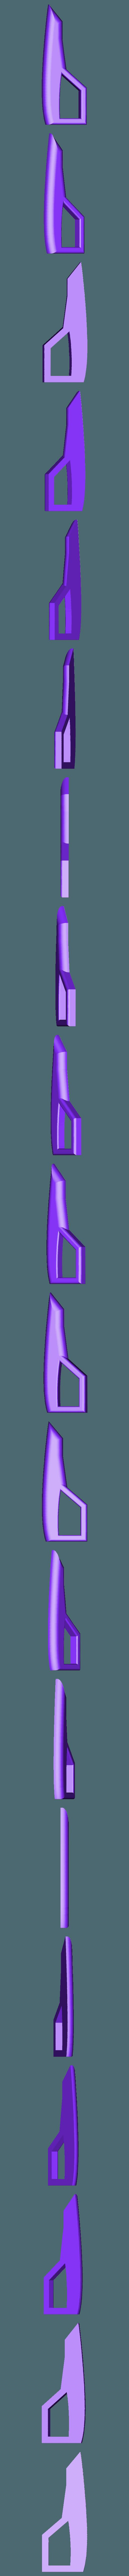 Side_Detail_2_Right.stl Télécharger fichier STL gratuit Borderlands Bandit Room Clener Shotgun • Modèle pour impression 3D, Dsk